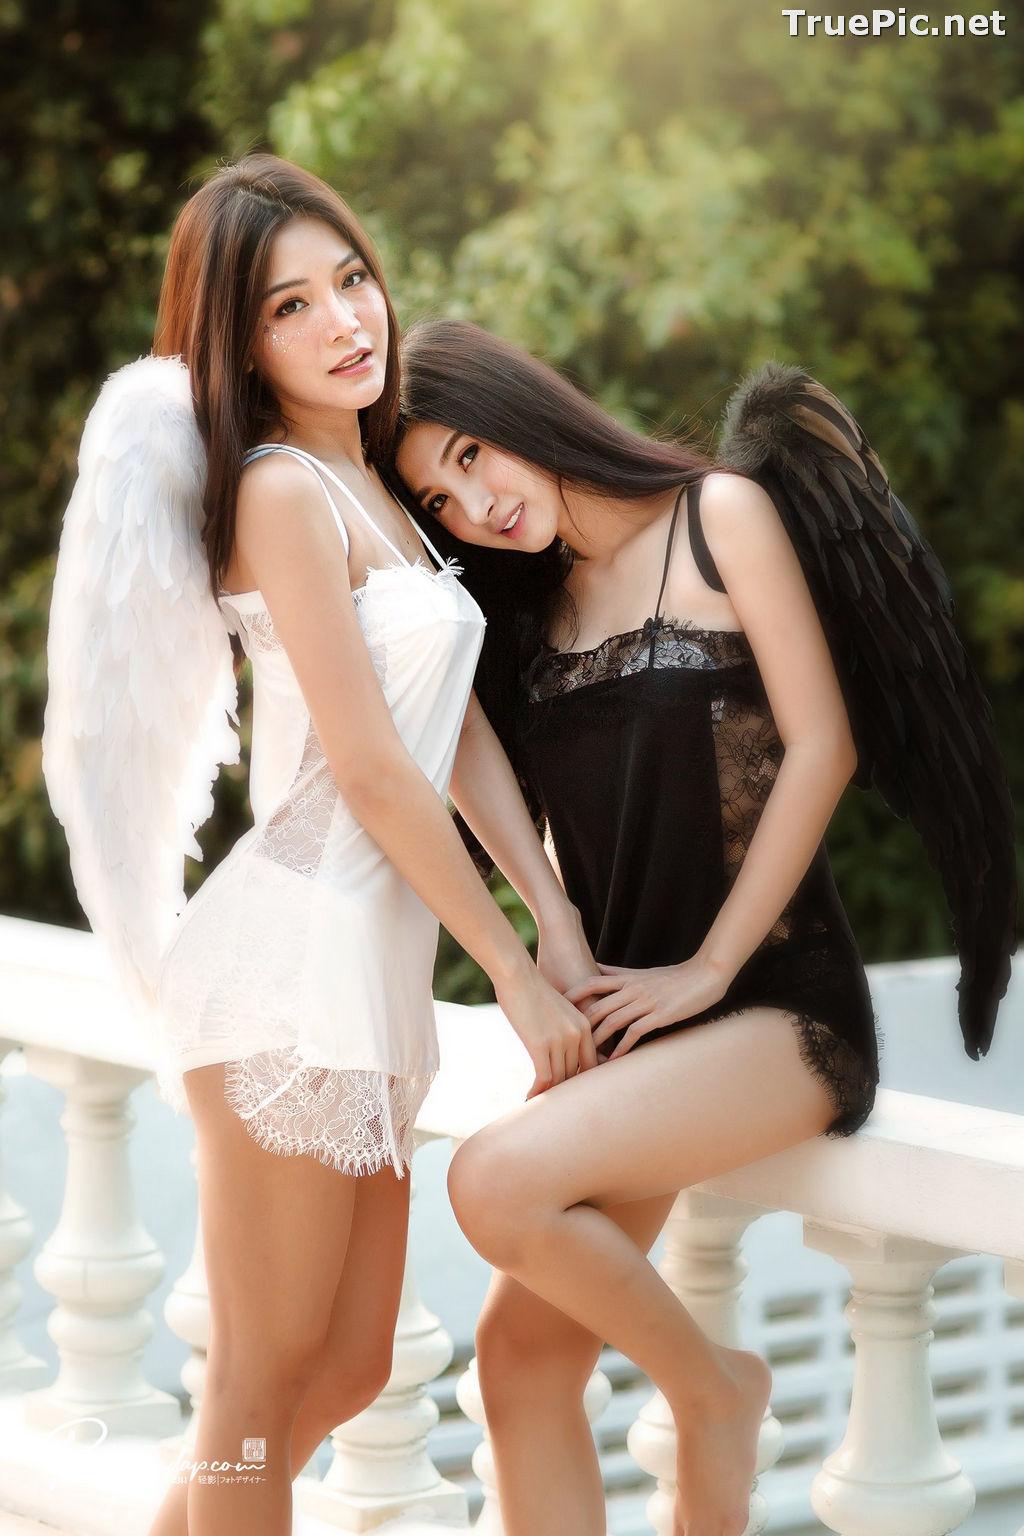 Image Thailand Model - Phitchamol Srijantanet and Pattamaporn Keawkum - Angel and Demon - TruePic.net - Picture-9